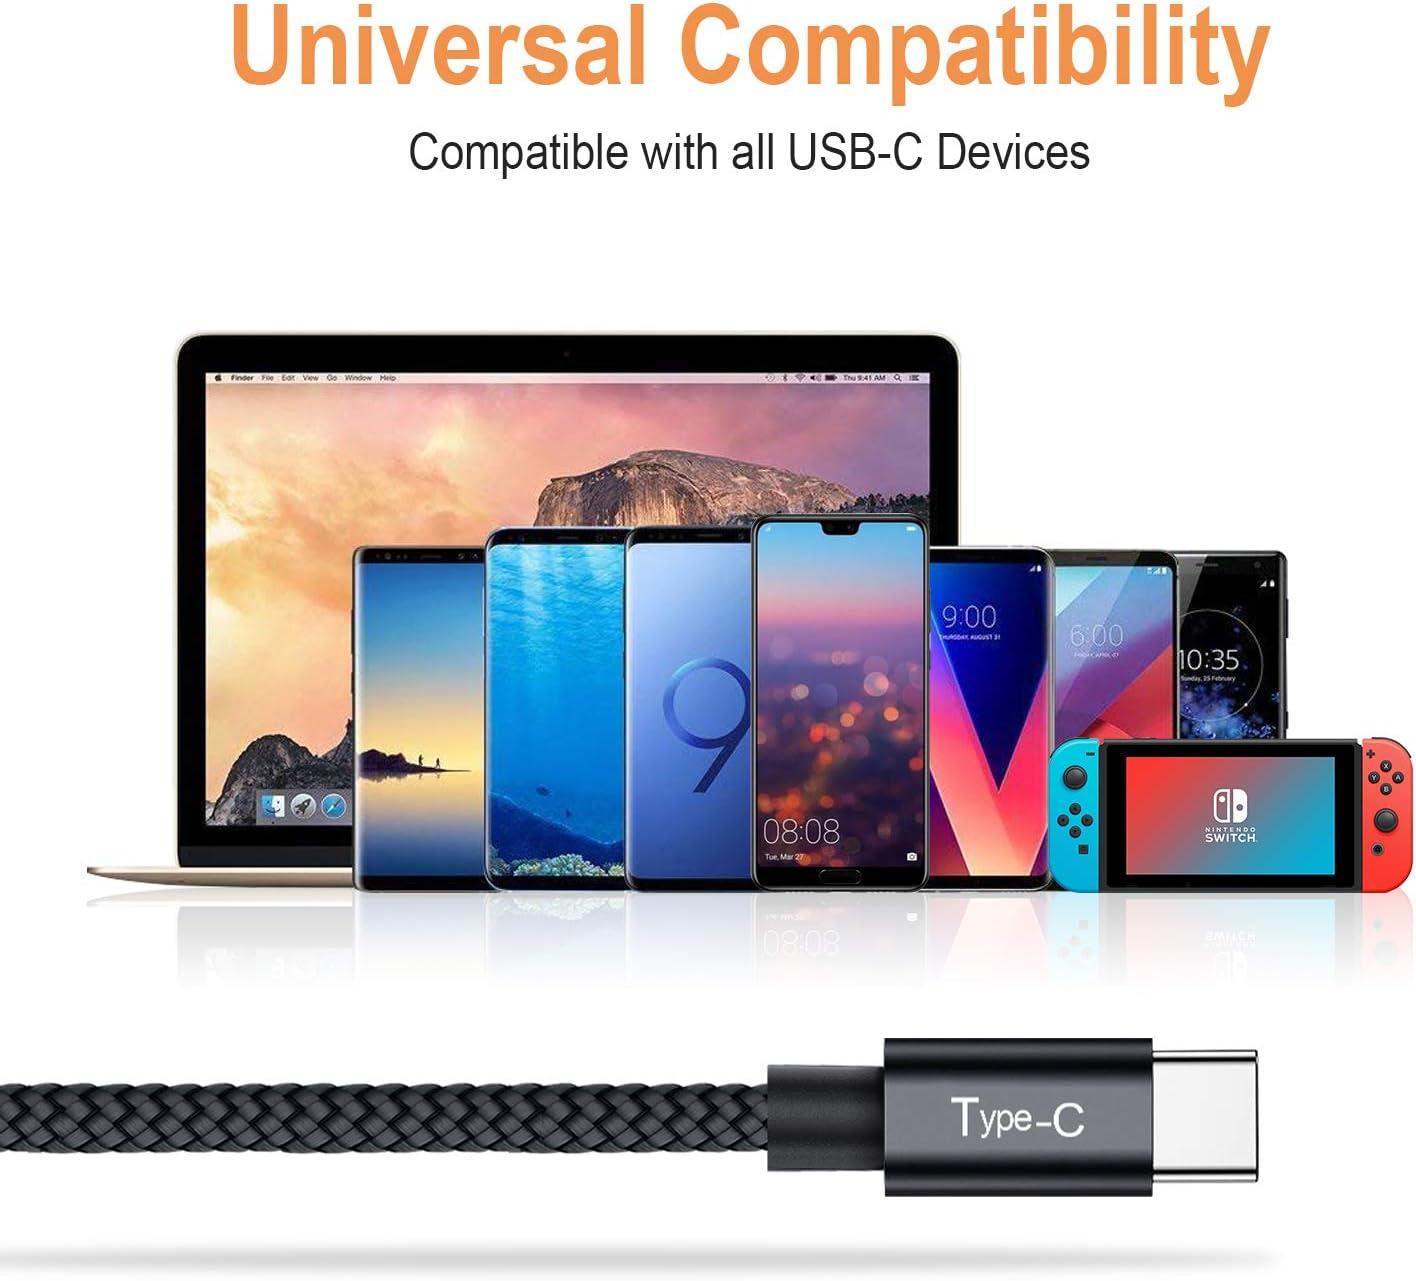 Avoalre Cable USB Tipo C 3× Cable Tipo C Nylon Carga Rápida para Samsung Galaxy S8/S9, Note 8, Huawei P9/P20/P10: Amazon.es: Electrónica